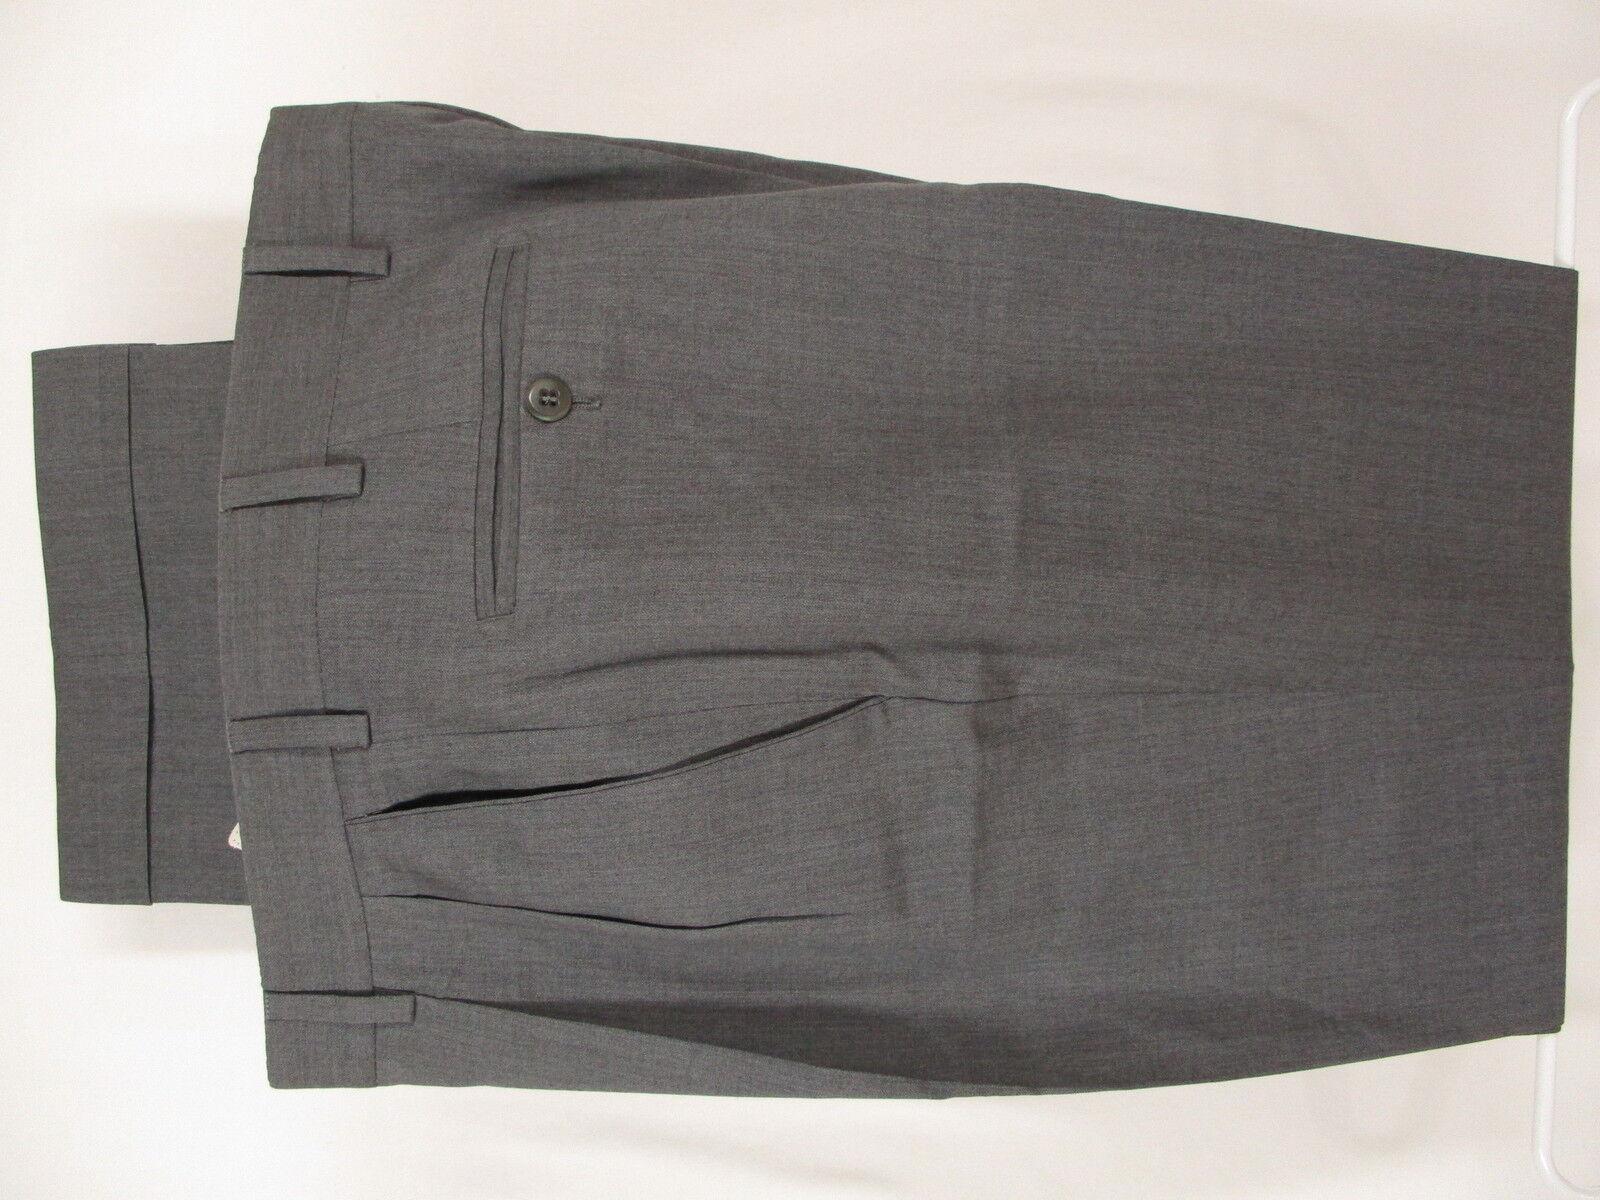 Zanella Bennett Mens Grey Pleated Wool Dress Pants Size 33 34x31